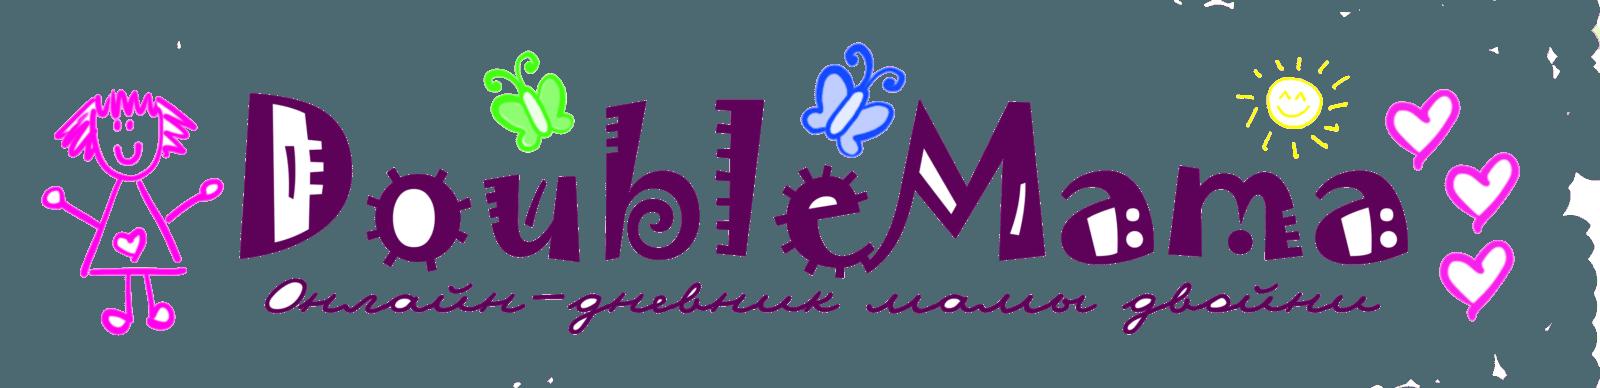 Онлайн-дневник мамы двойняшек